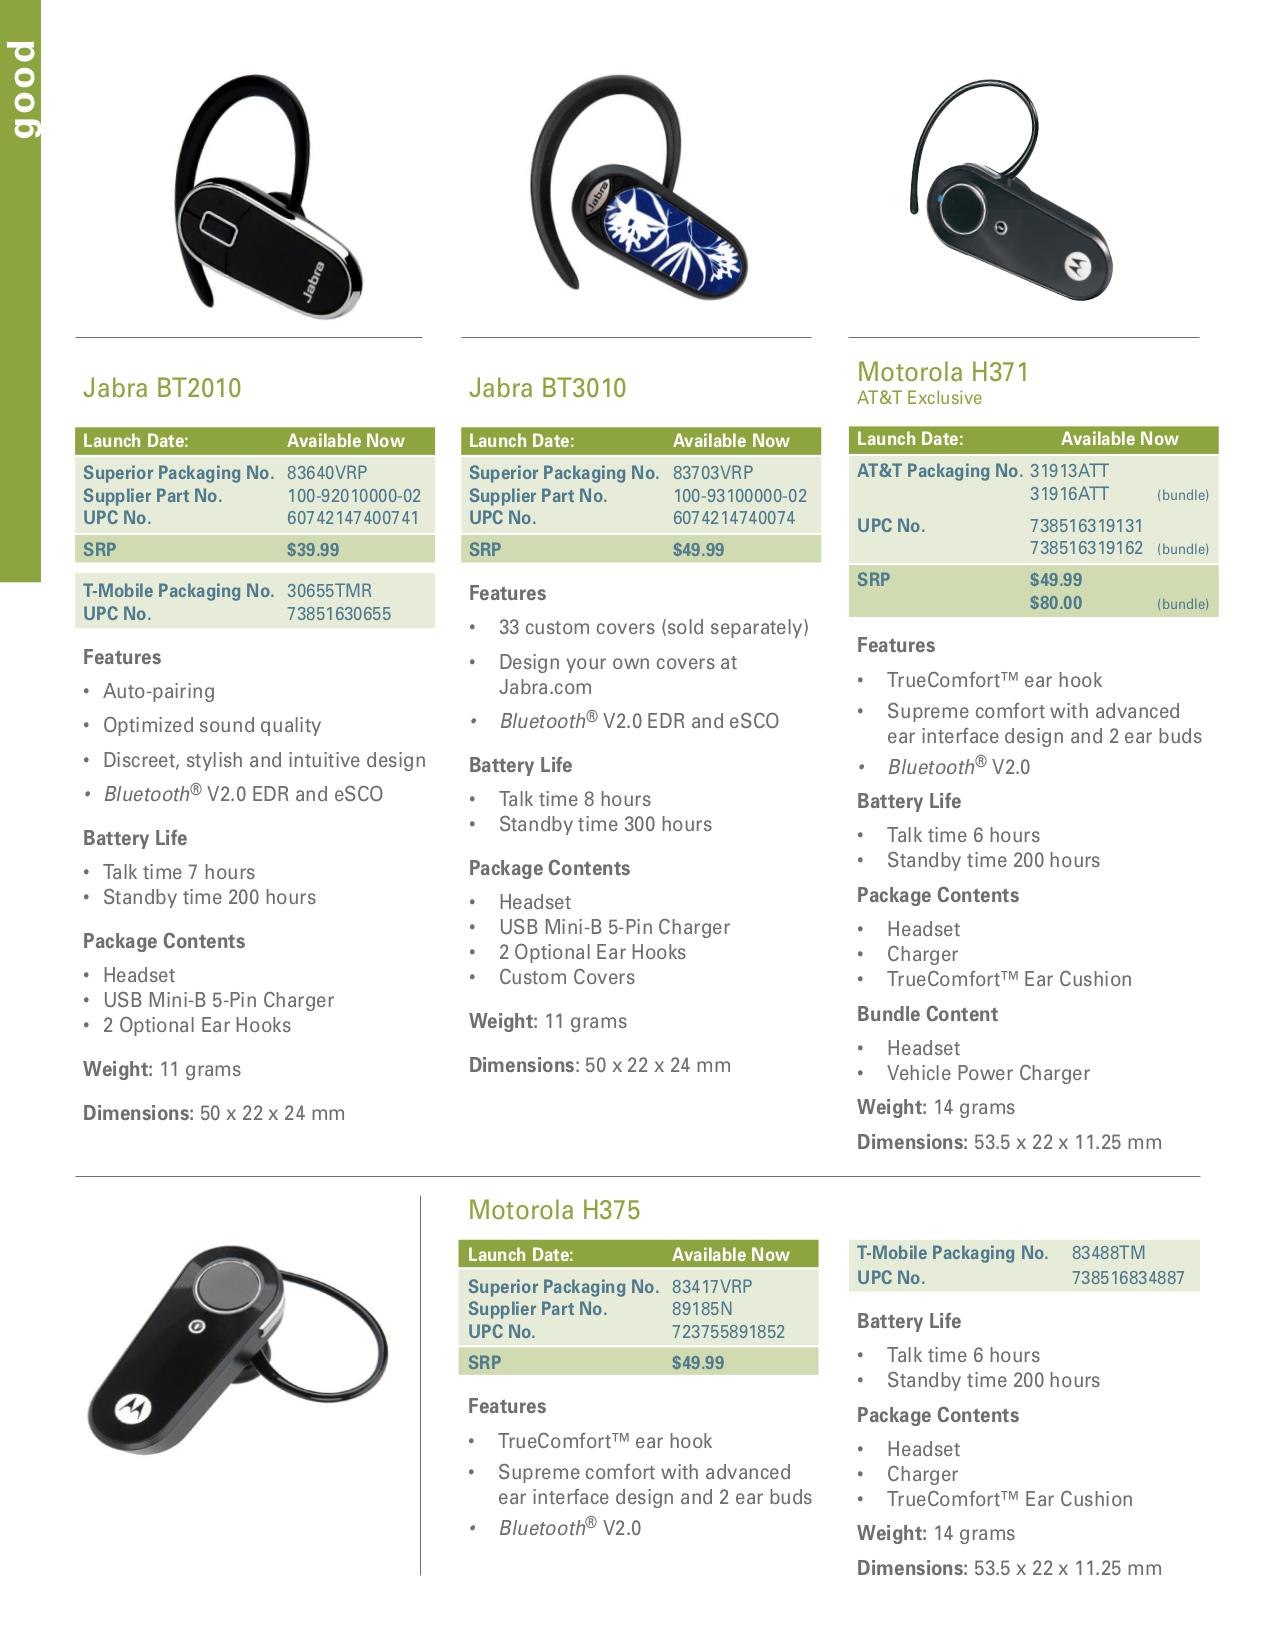 pdf manual for jabra headset bt3010 rh umlib com jabra bt3010 manual